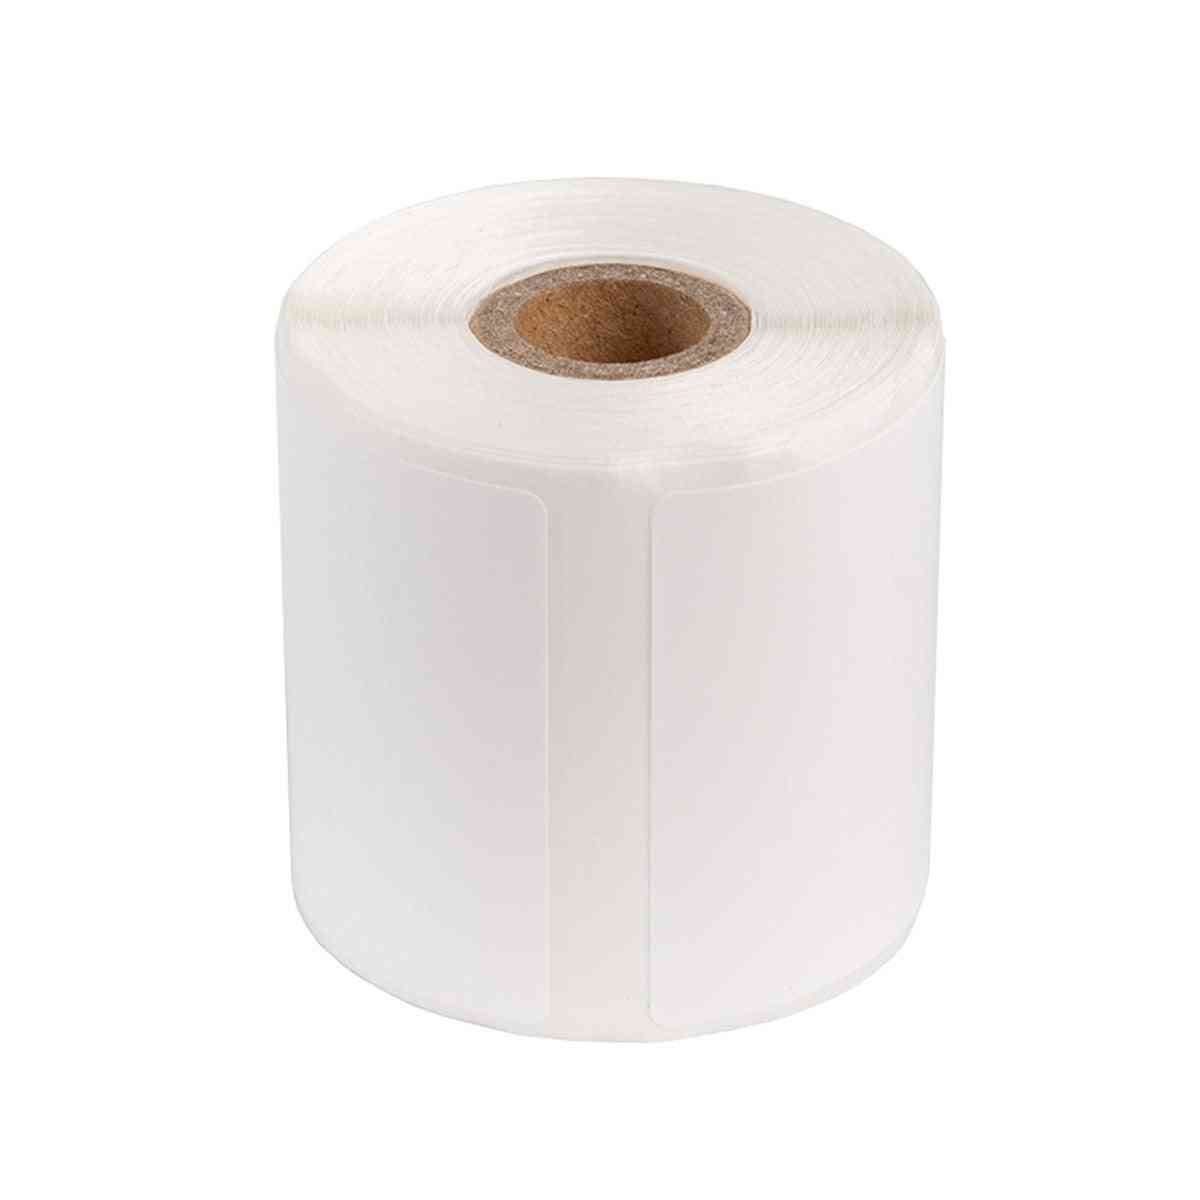 Self-adhesive Thermal Paper Roll